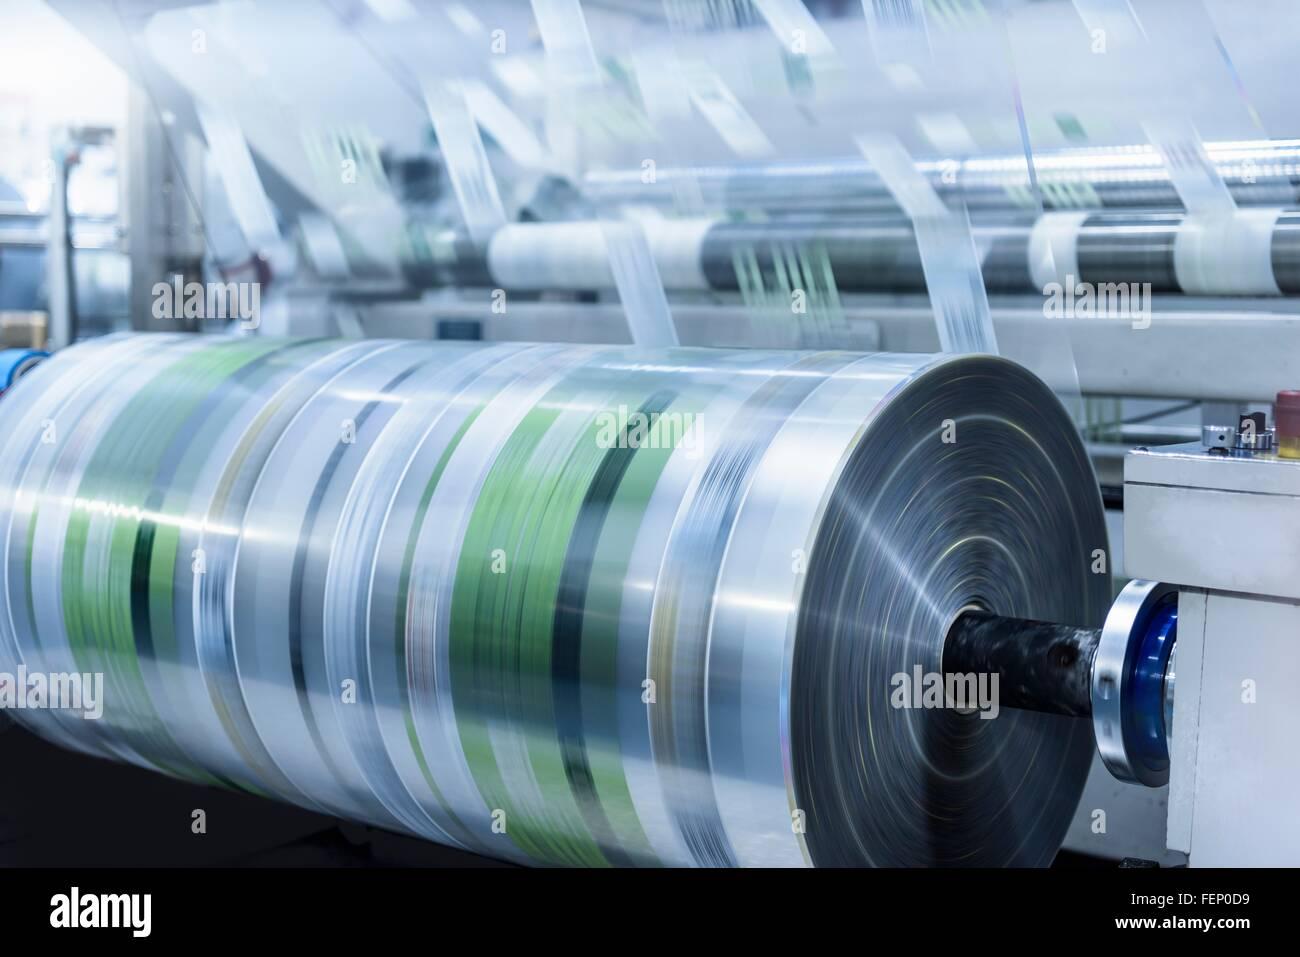 Rolls of printed plastic film in food packaging printing factory - Stock Image